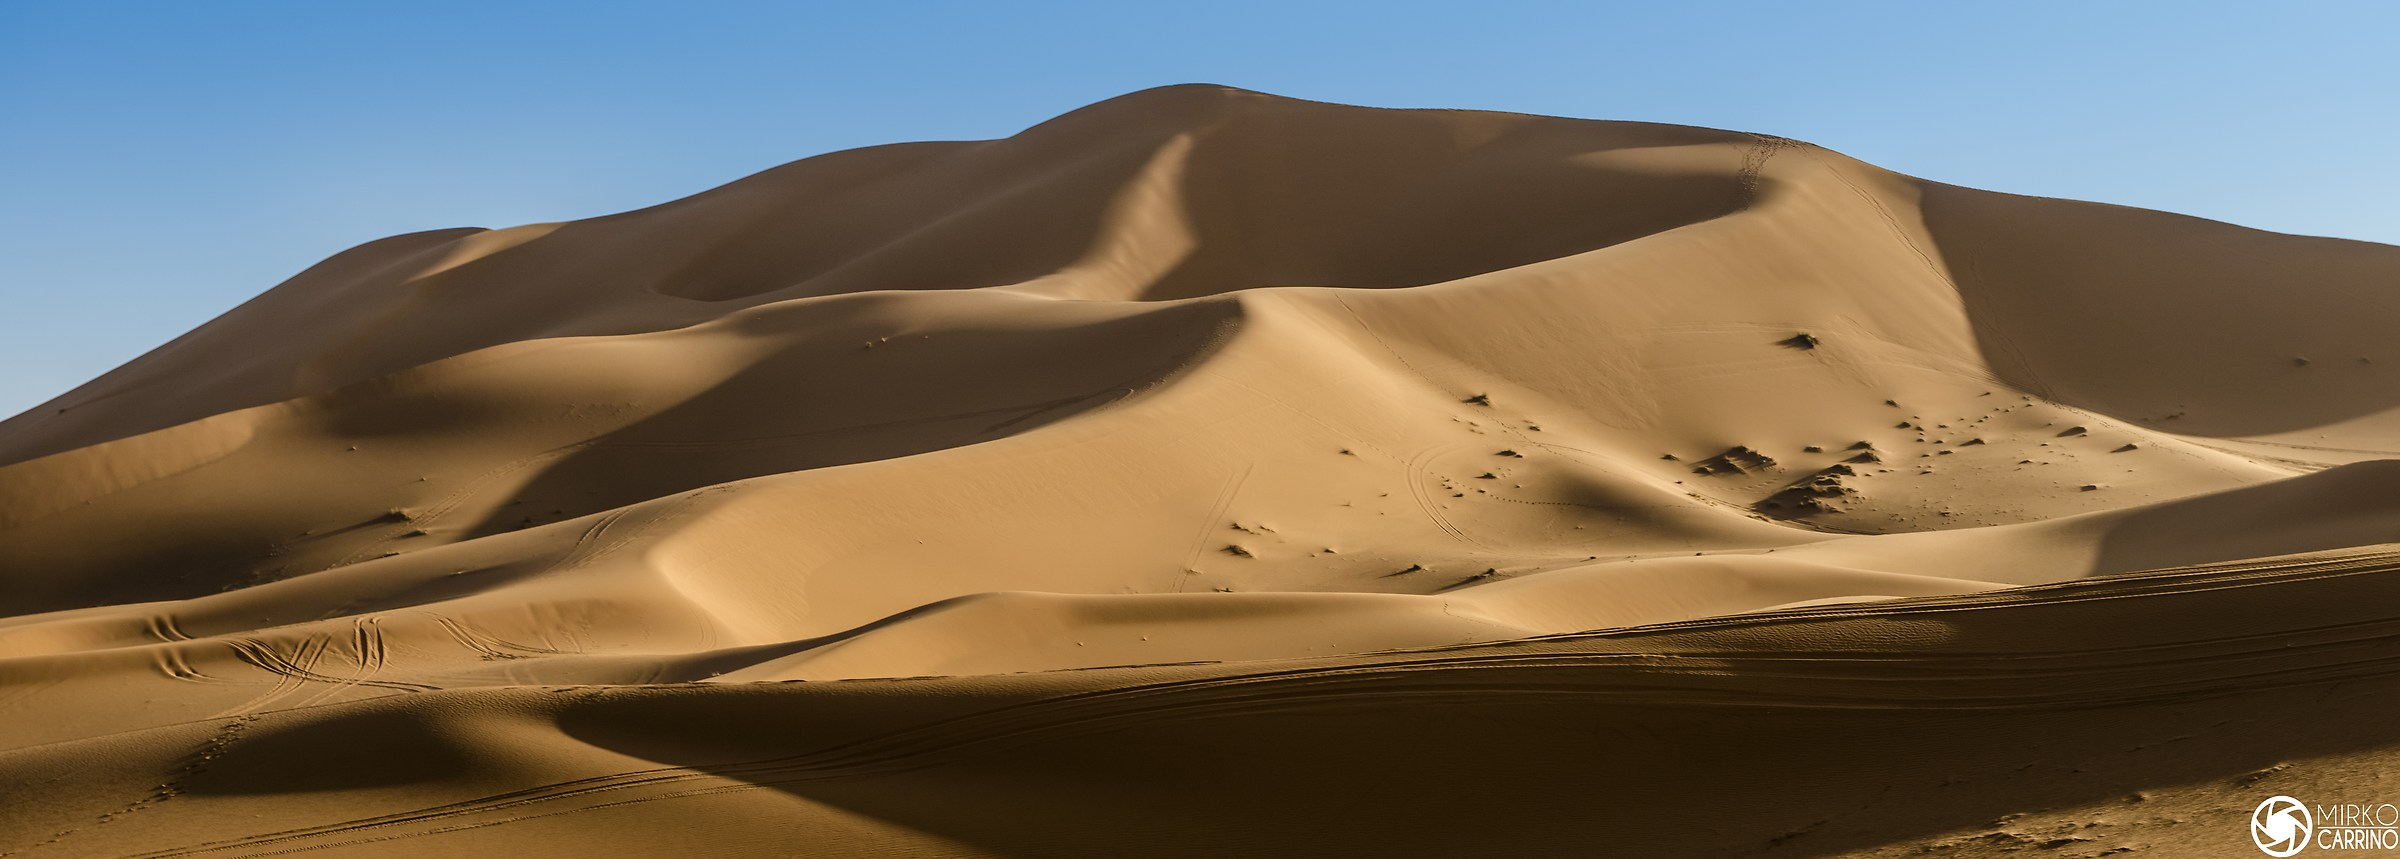 Shadows in the desert...